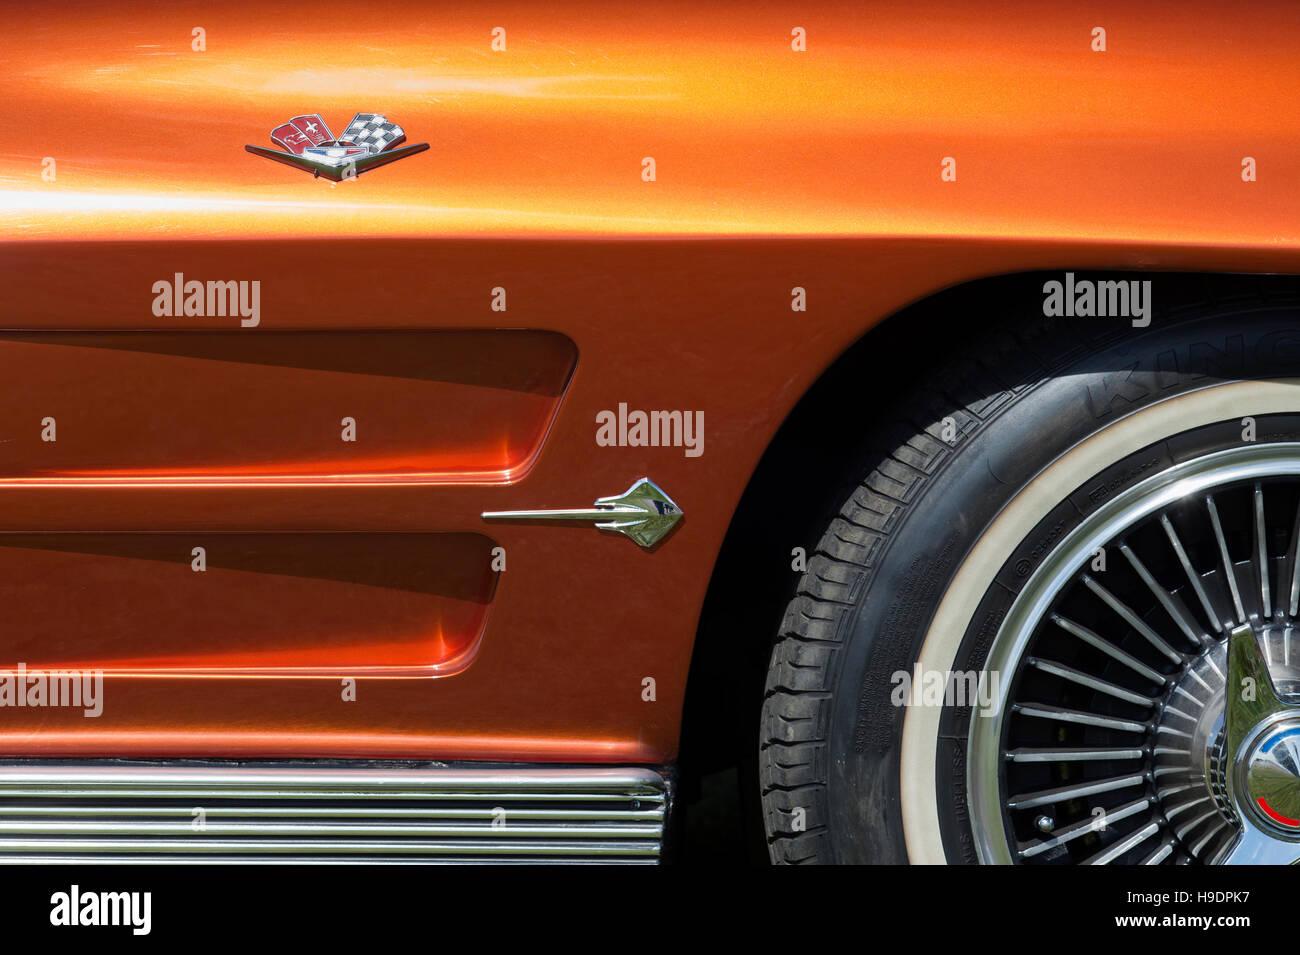 Chevrolet Corvette Stingray Classic American Sports Car Absrtract H Dpk